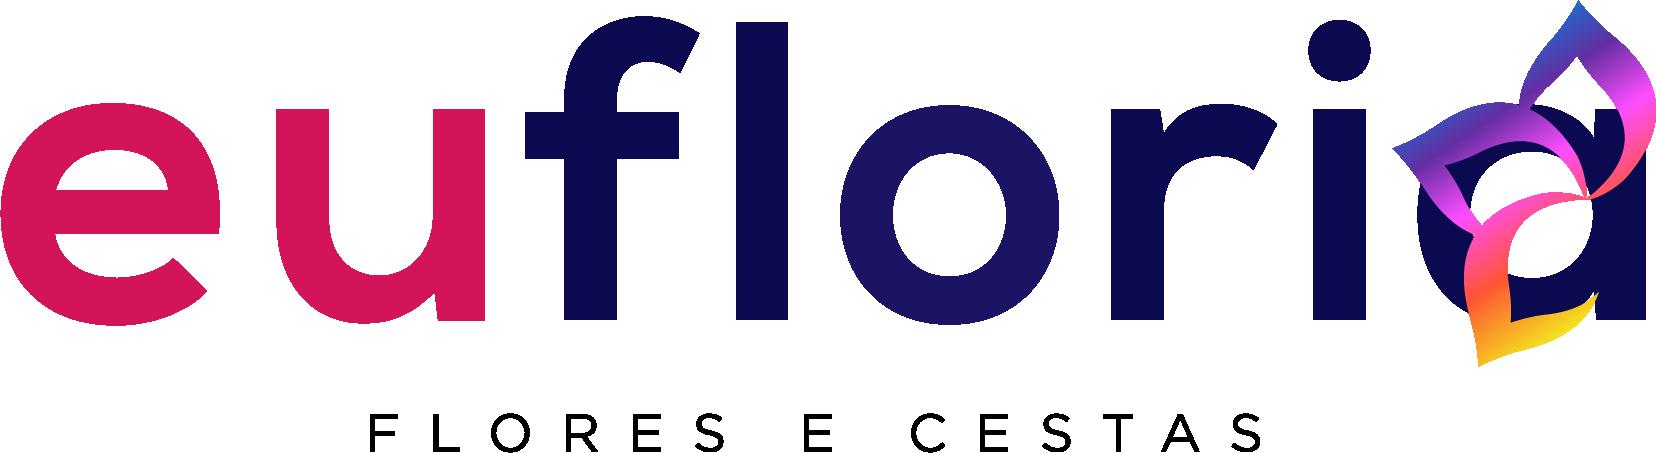 Eufloria Flores - Floricultura Online